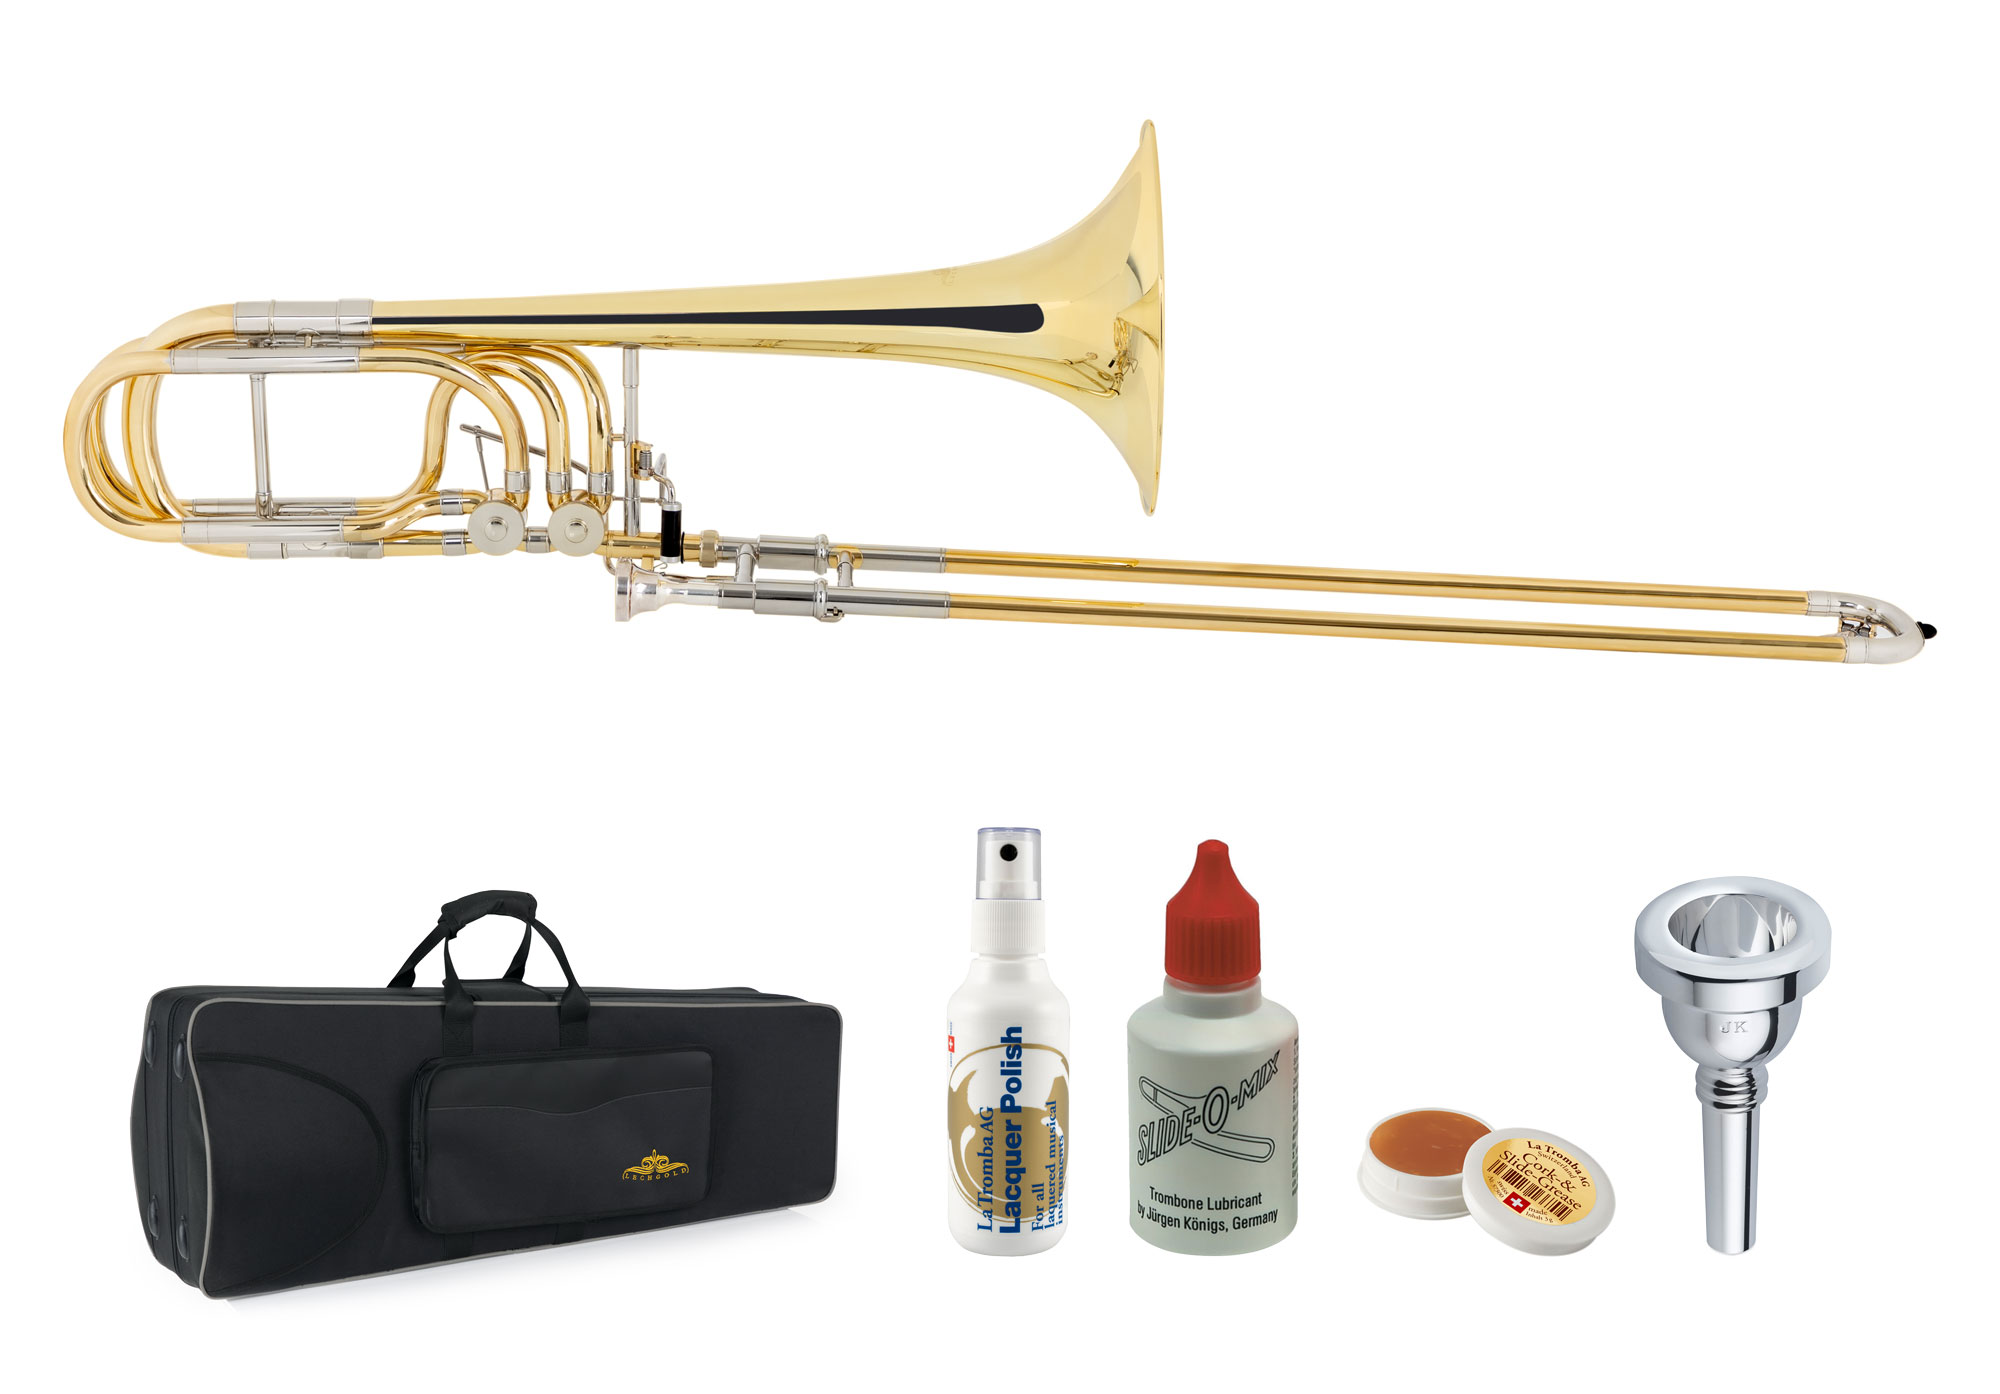 Posaunen - Lechgold BP 18L Bassposaune Messing Deluxe Set - Onlineshop Musikhaus Kirstein